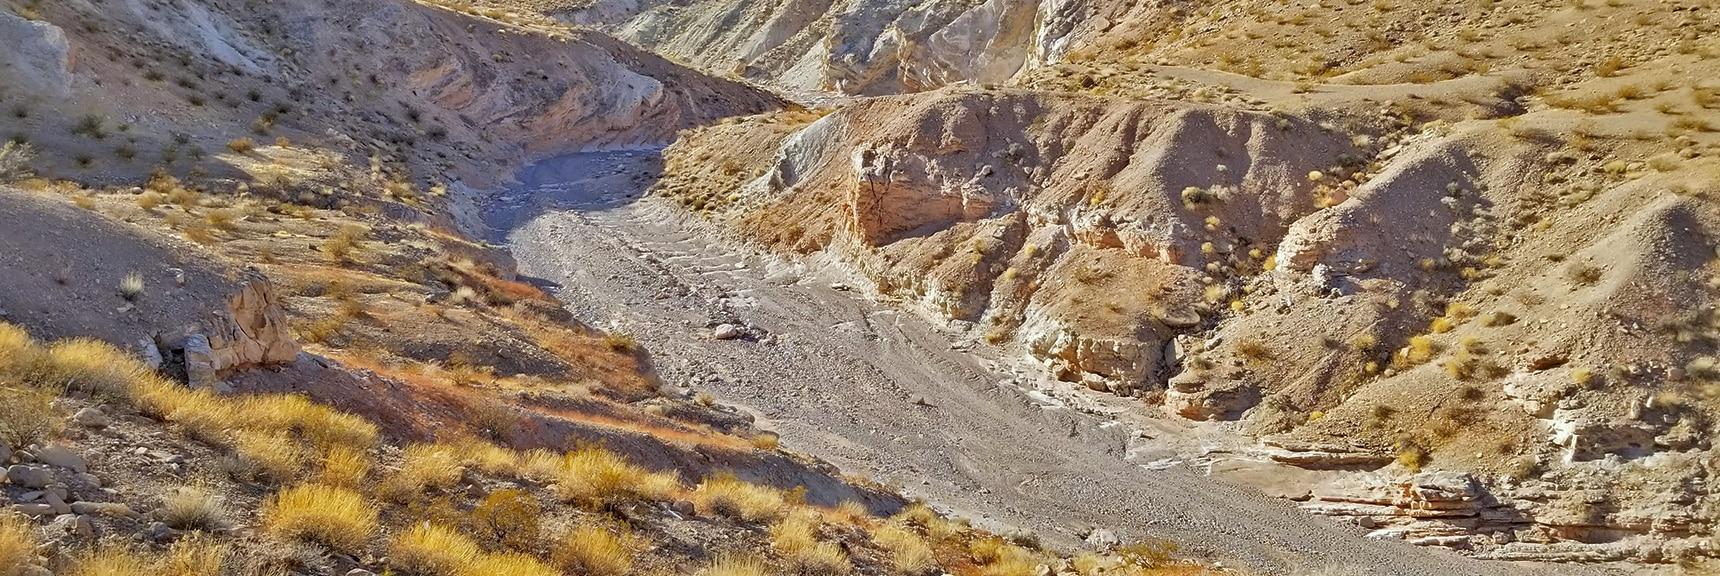 Looking Back Down Anniversary Narrows Run-off Wash   Anniversary Narrows   Muddy Mountains Wilderness, Nevada